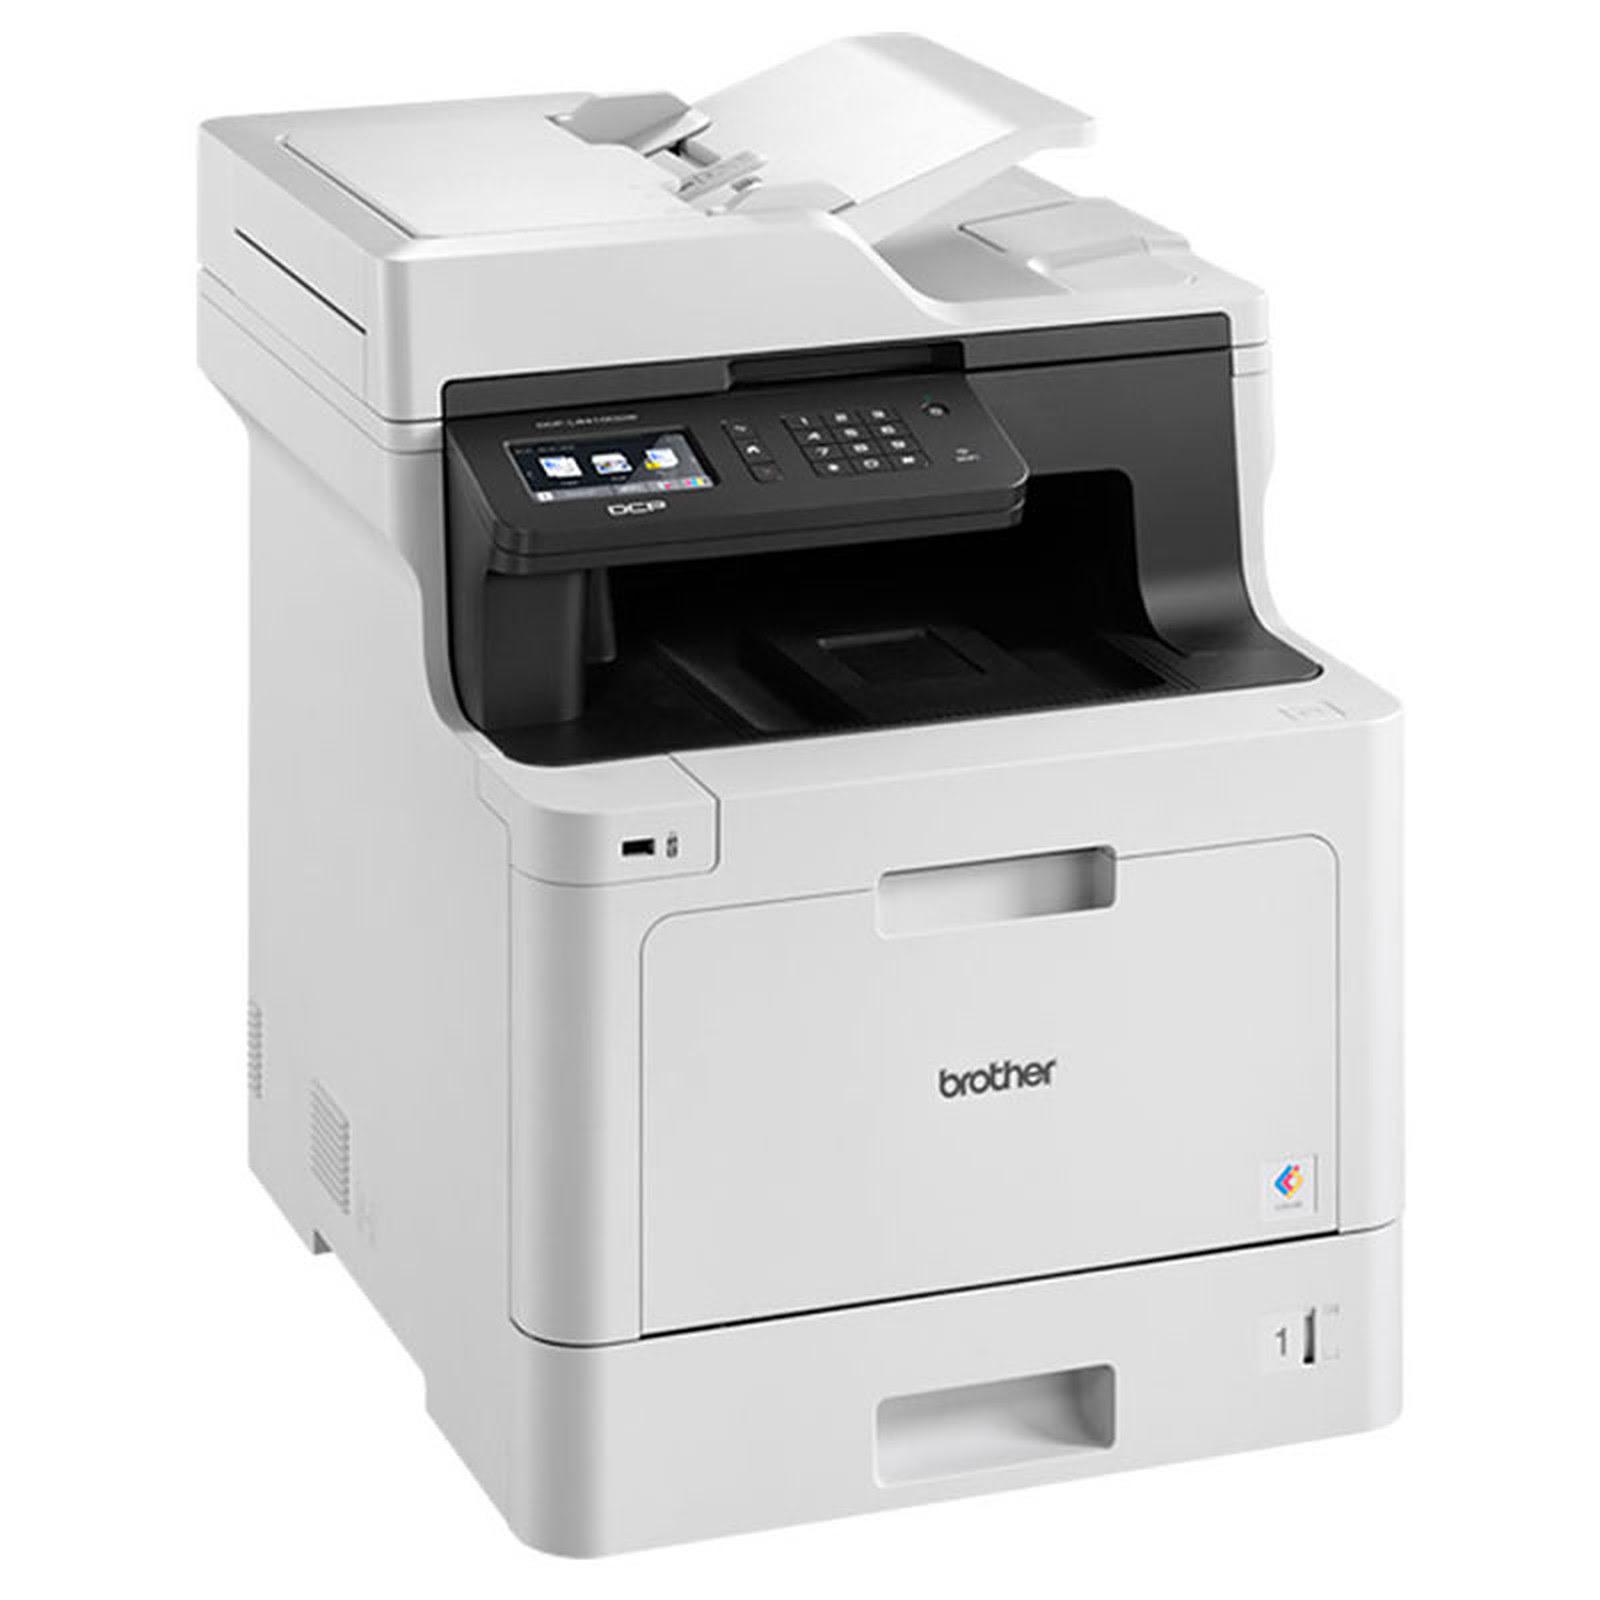 Imprimante multifonction Brother DCP-L8410CDW - Cybertek.fr - 2